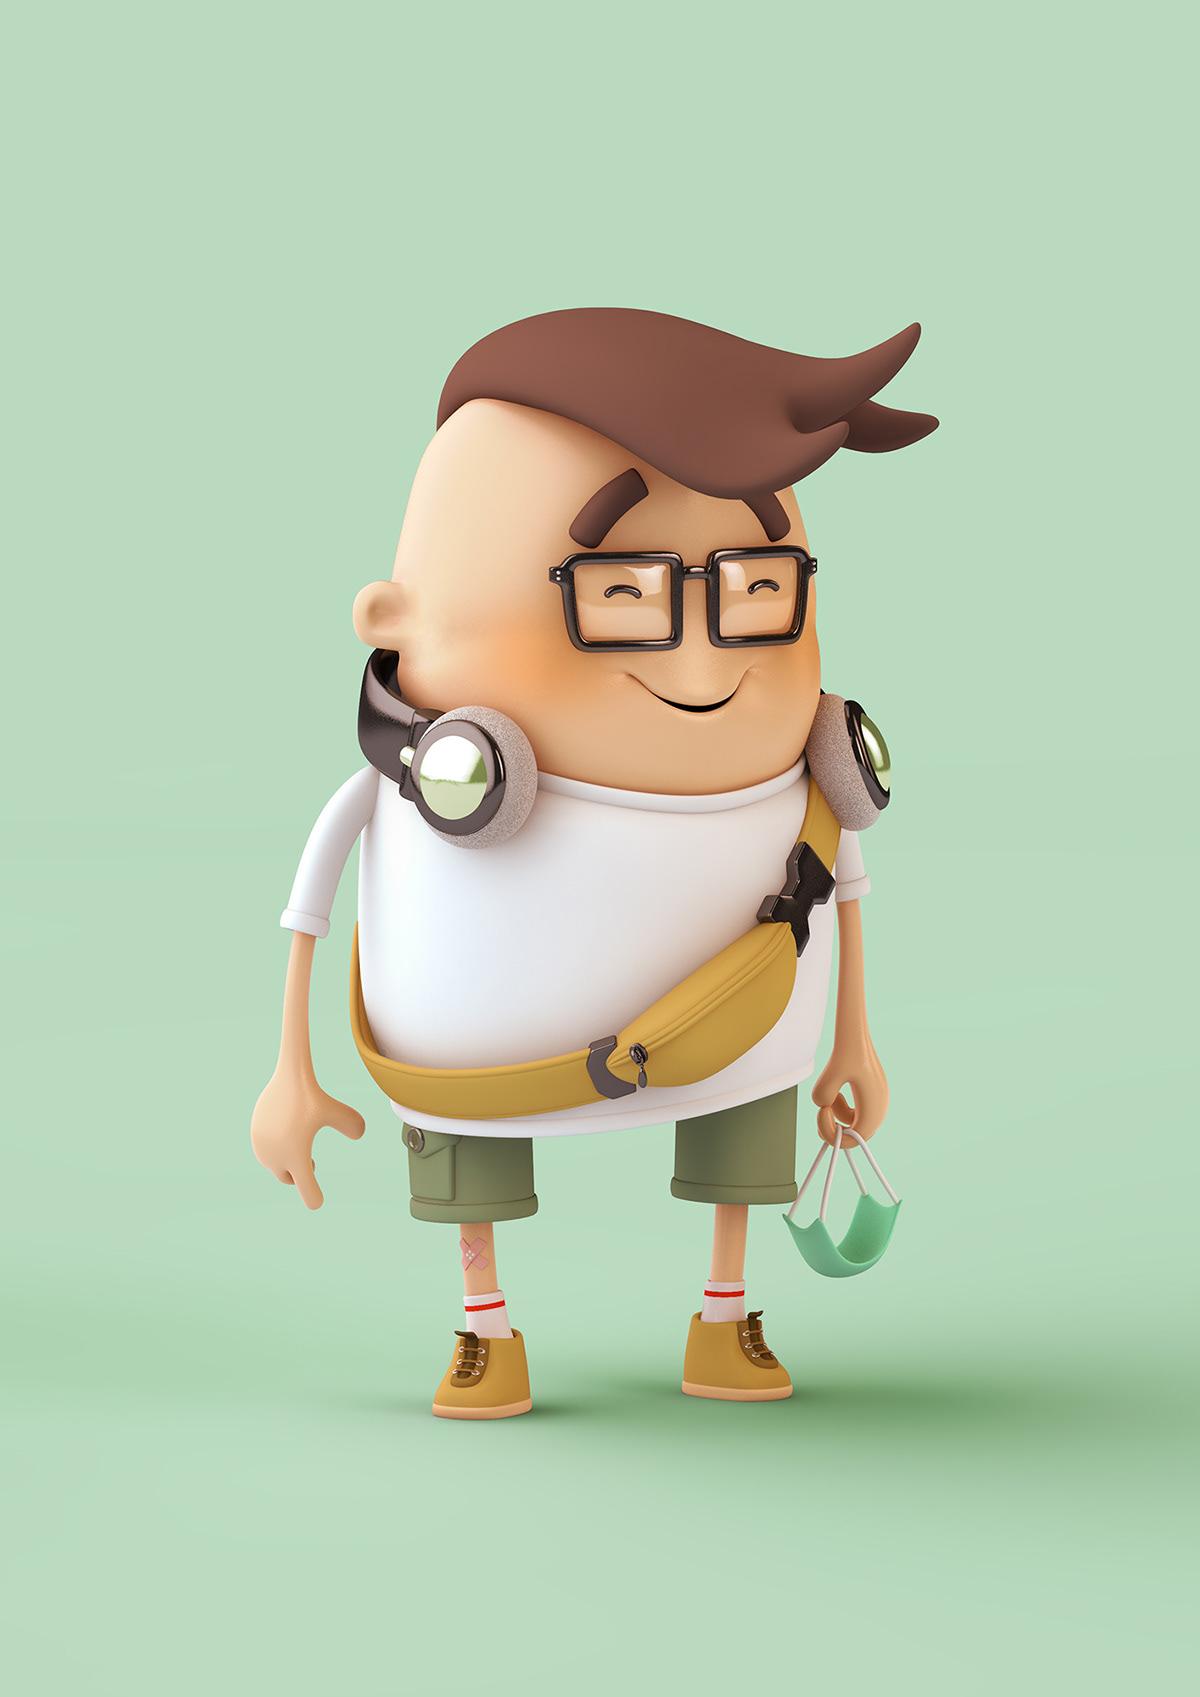 3D Character characterdesign gmehling ILLUSTRATION  International mask stereotypes